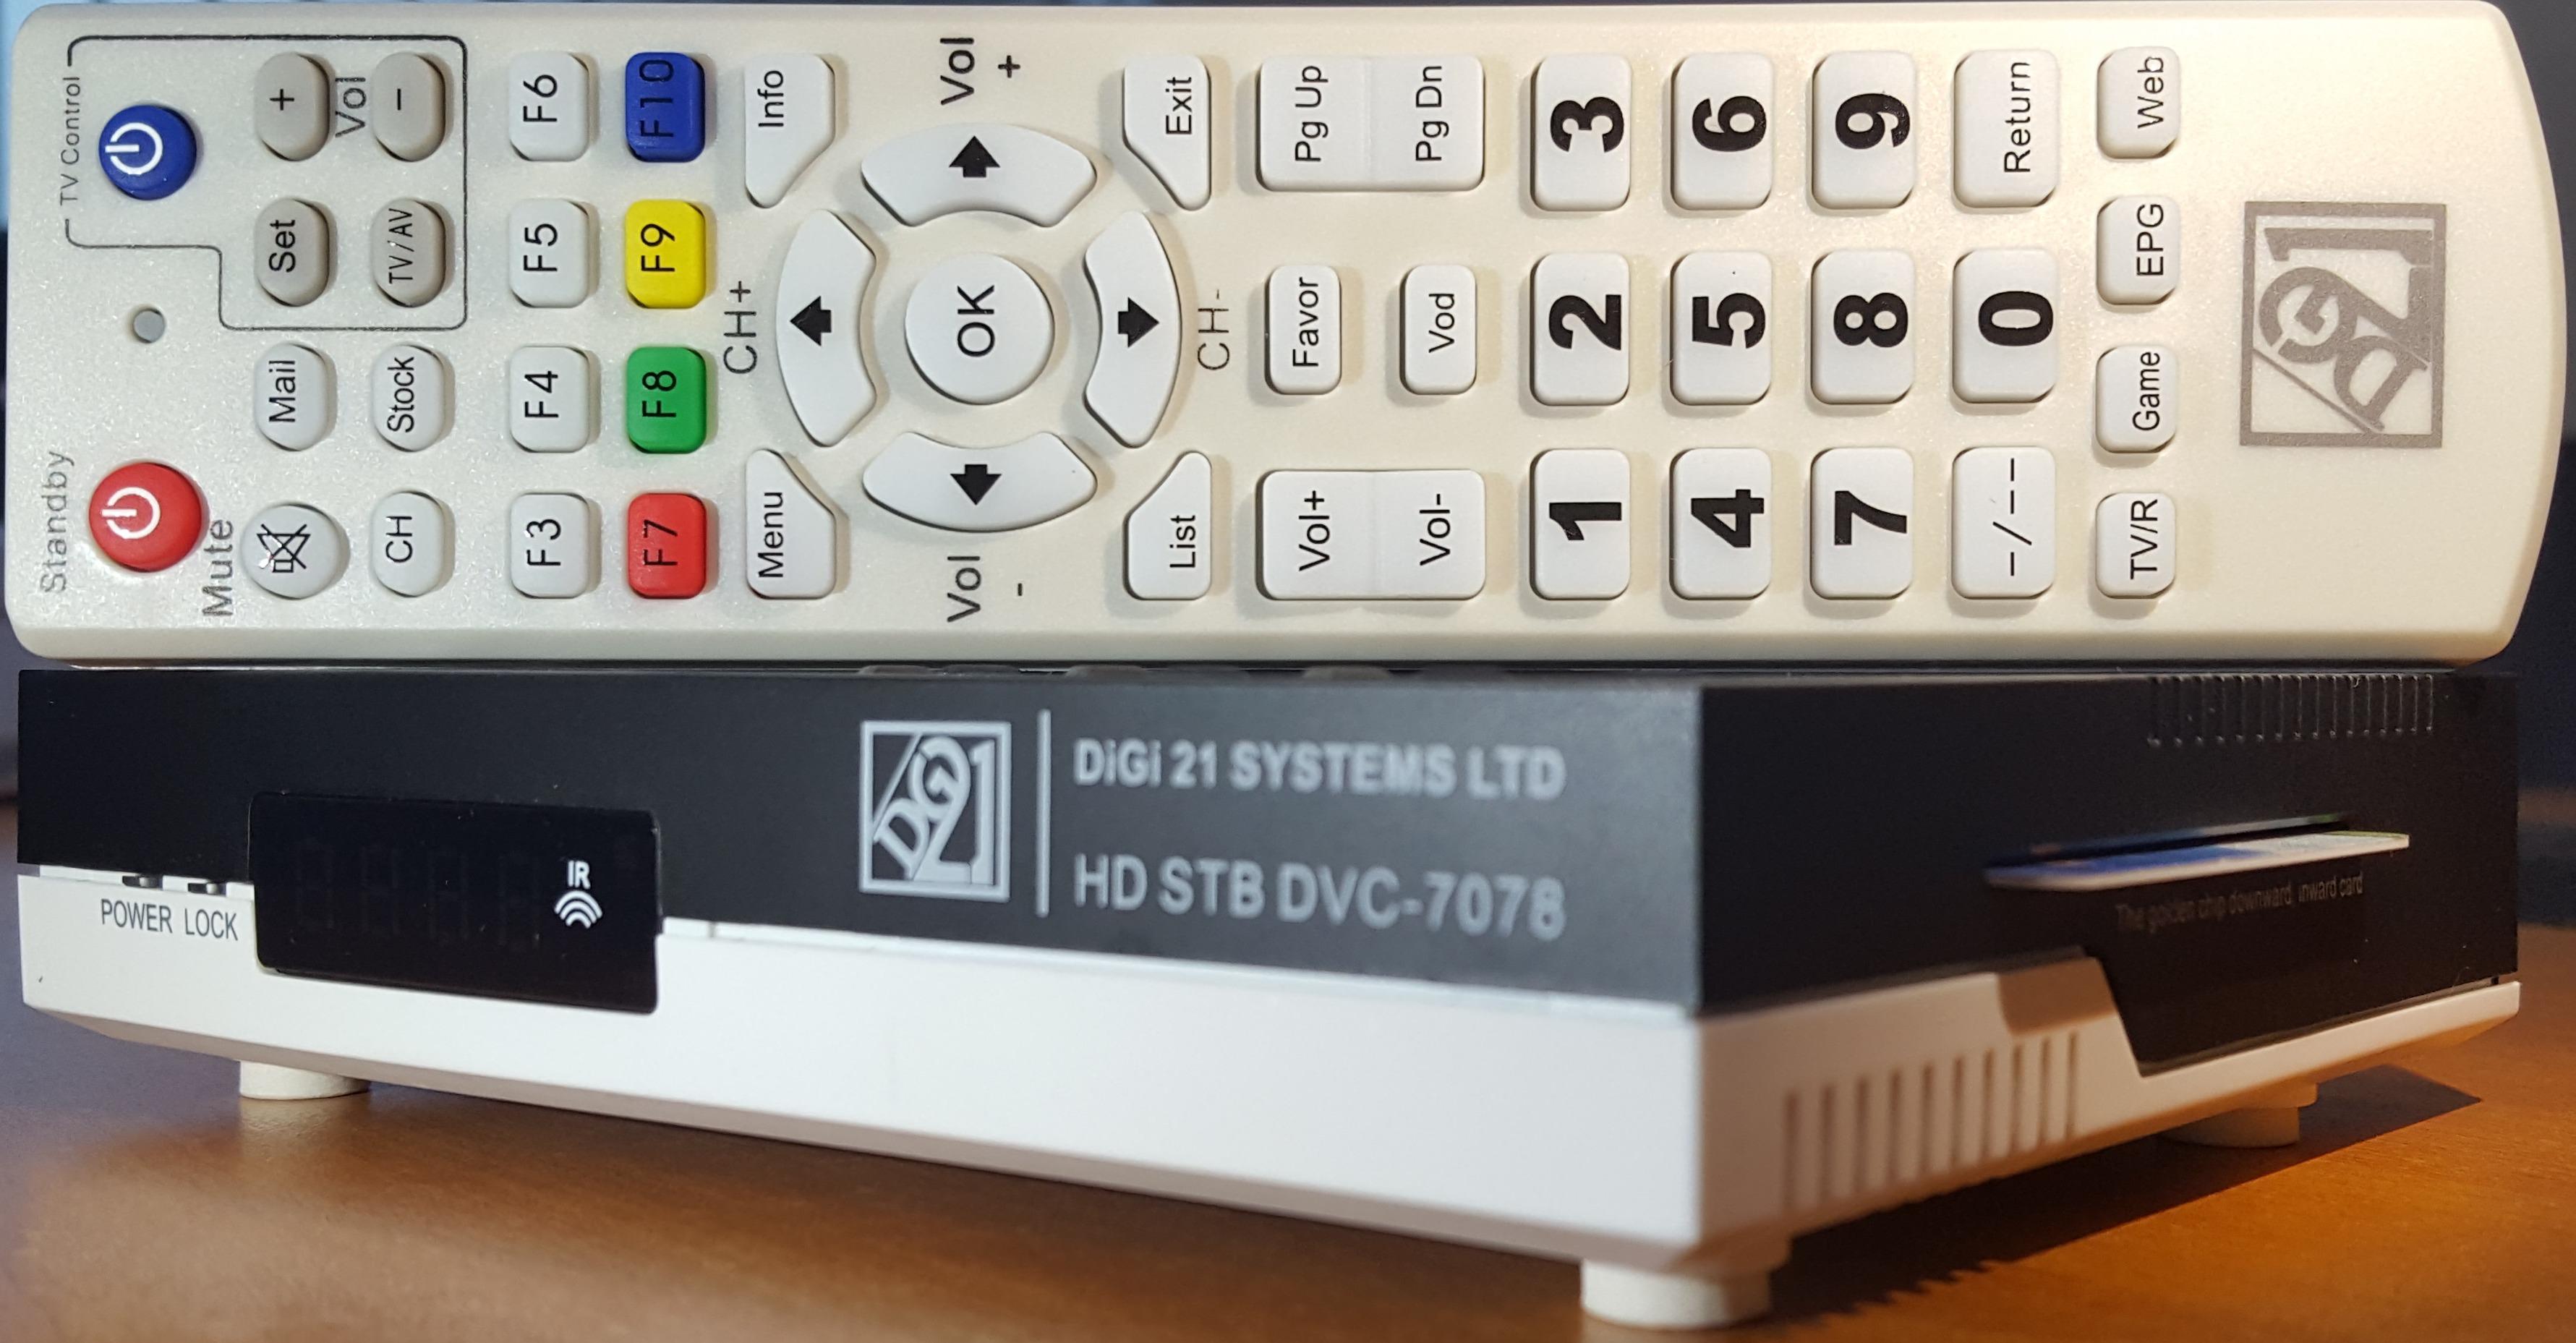 Digi21 Systems Ltd Digital Cable